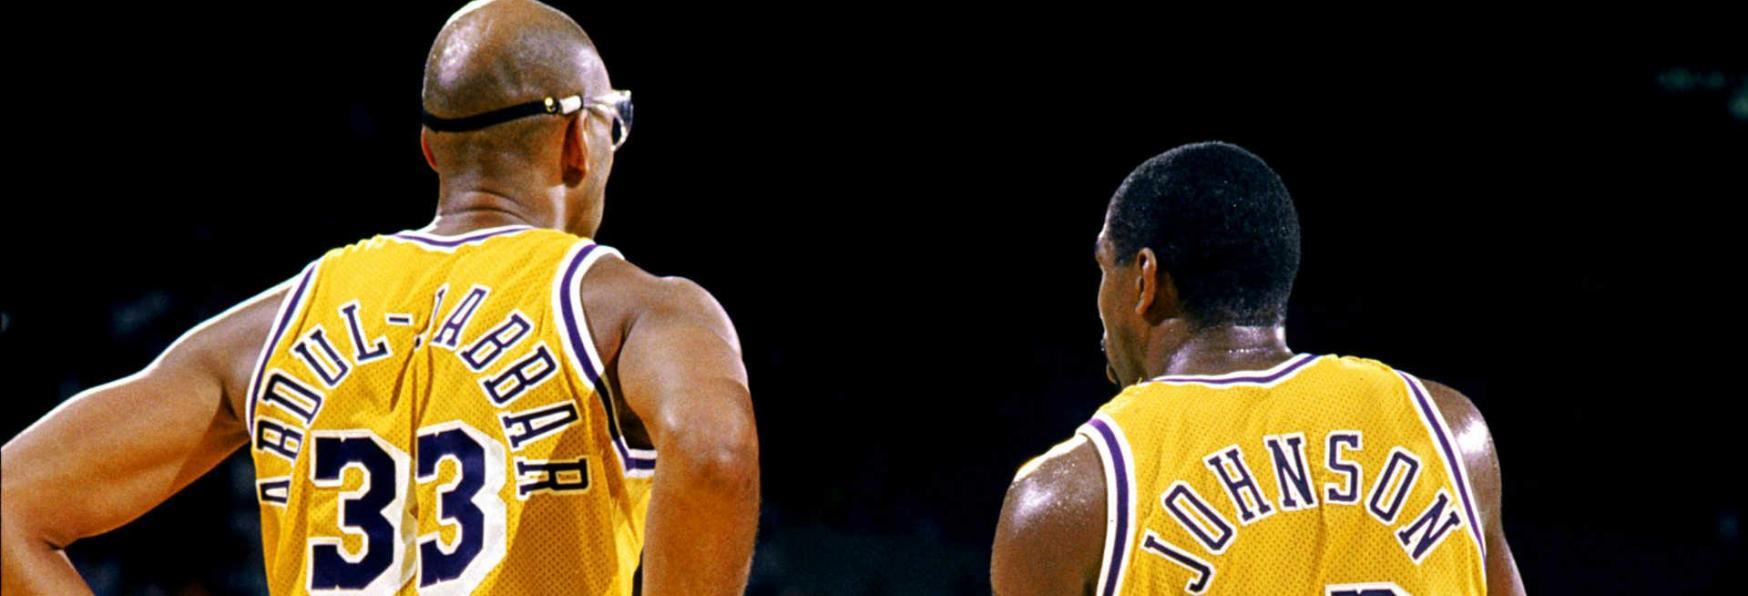 Jason Segel interpreterà Paul Westhead nella nuova Serie TV HBO sui Lakers